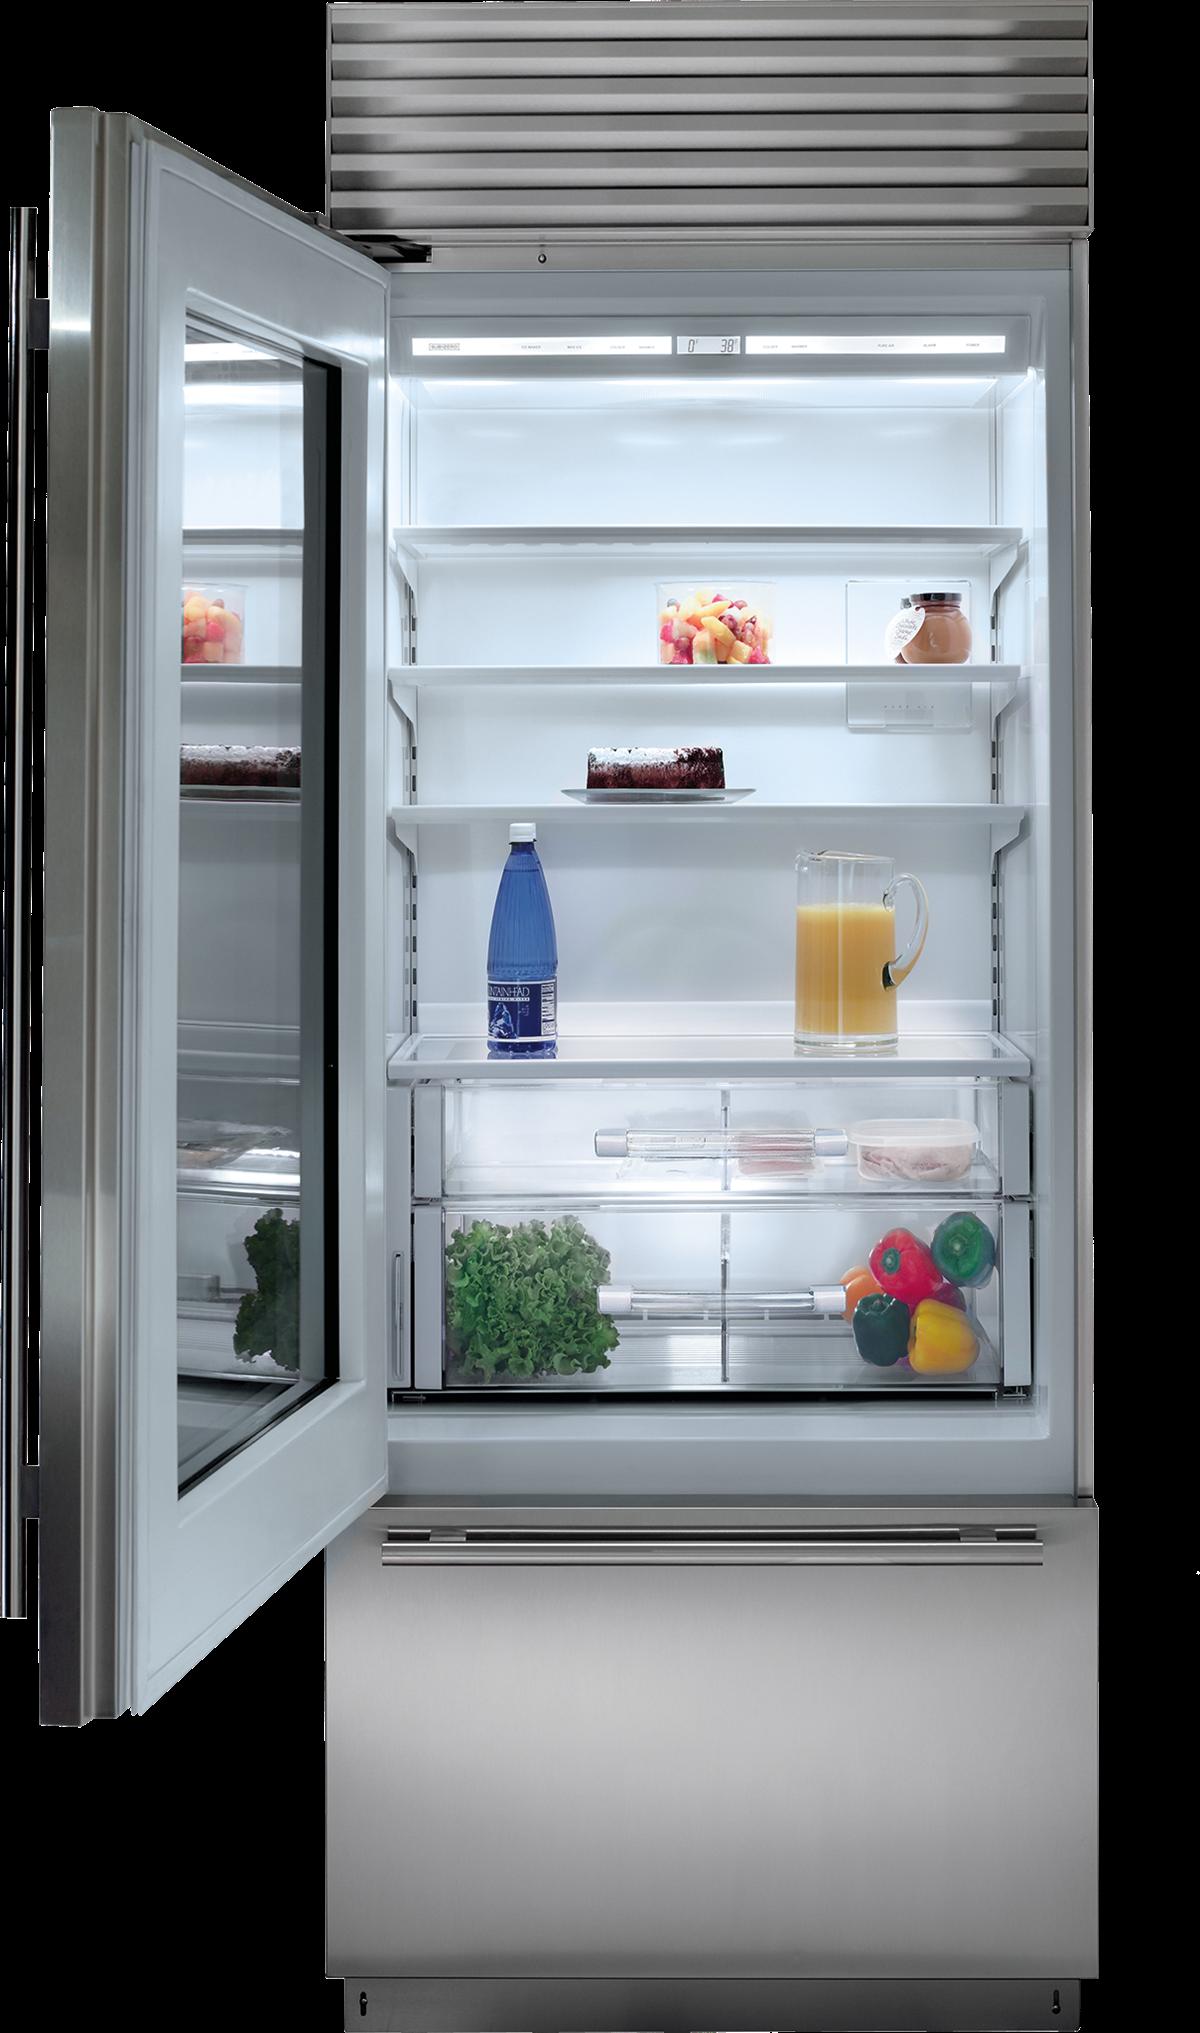 Sub Zero 30 Classic Over And Under Refrigerator Freezer With Glass Door Panel Ready Bi 30ug O Refrigerator Freezer Glass Door Refrigerator Glass Door Fridge